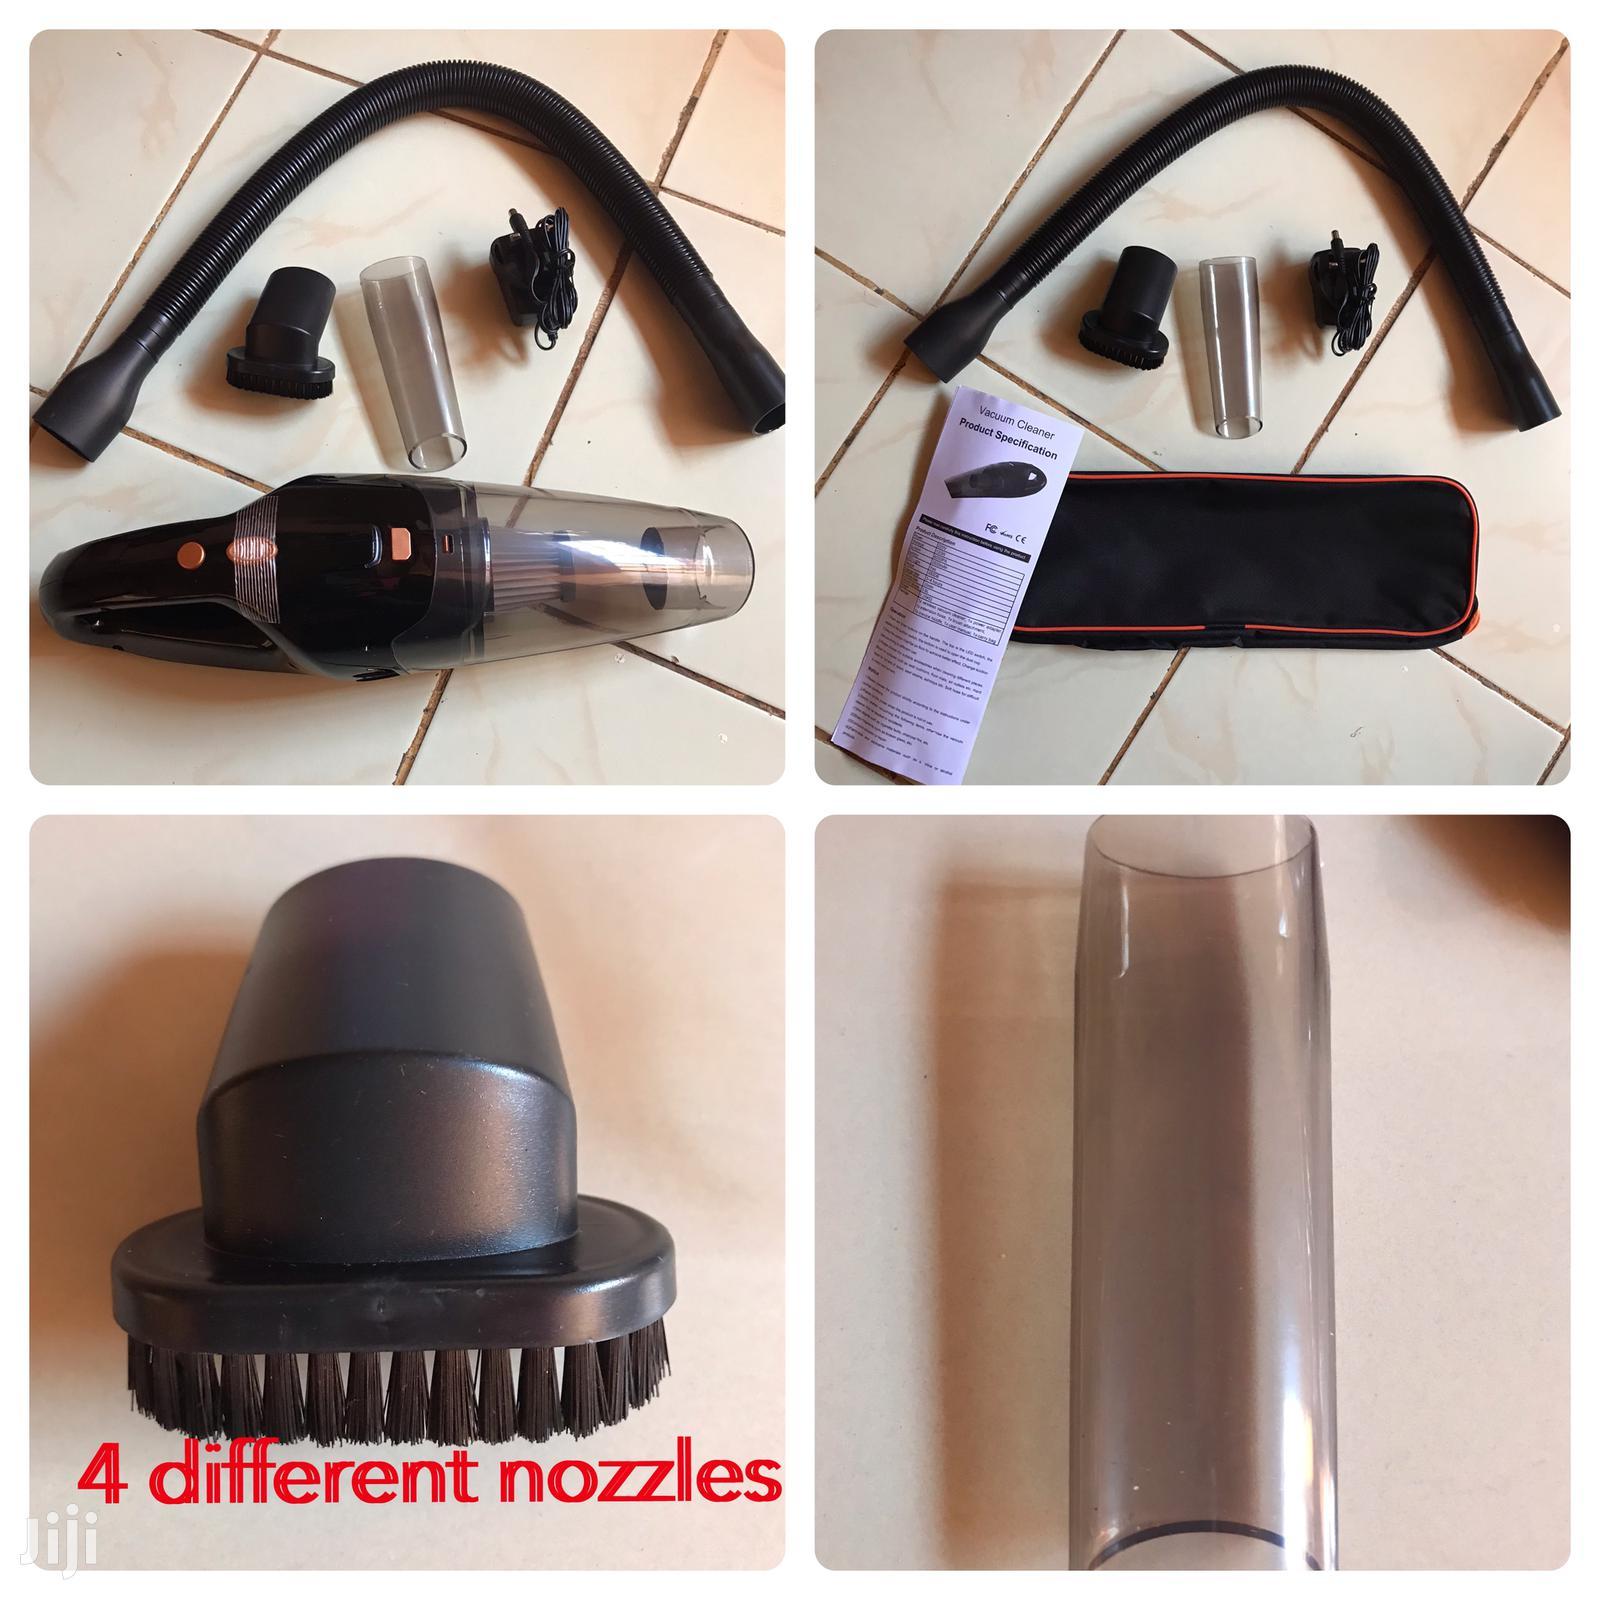 Handheld Wet & Dry Vacuum Cleaner | Home Appliances for sale in Nairobi Central, Nairobi, Kenya